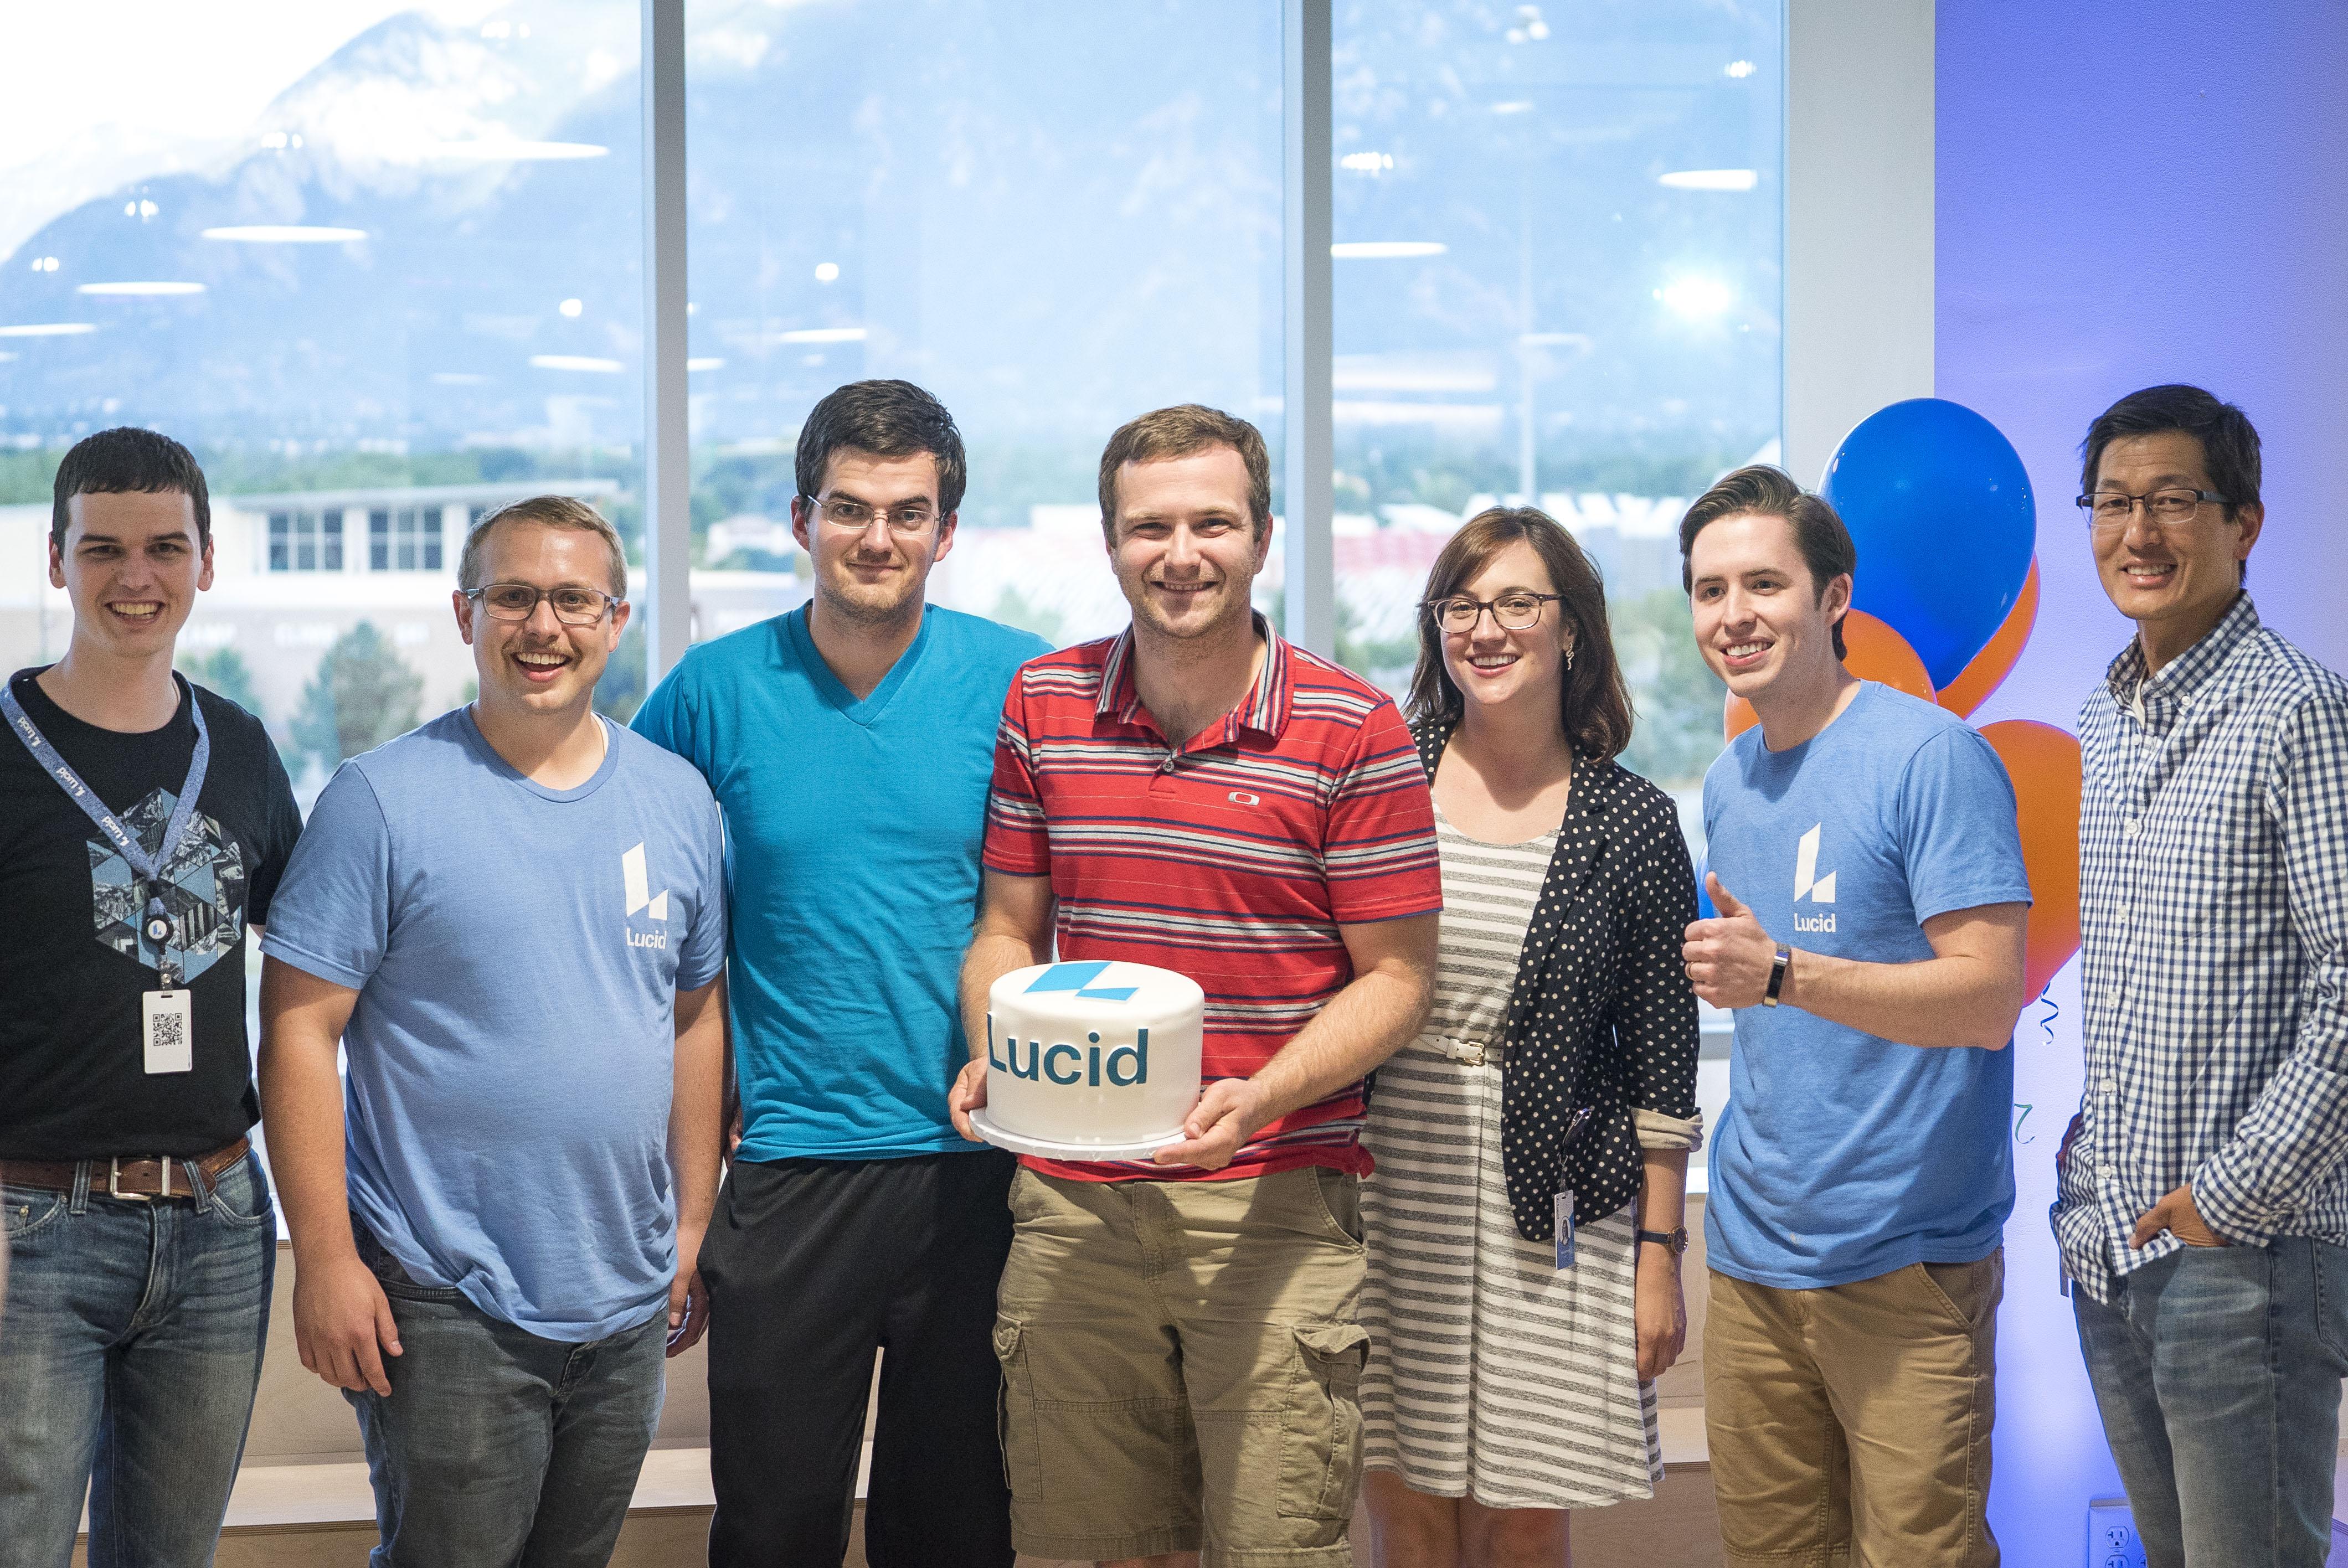 2018 hackathon winners